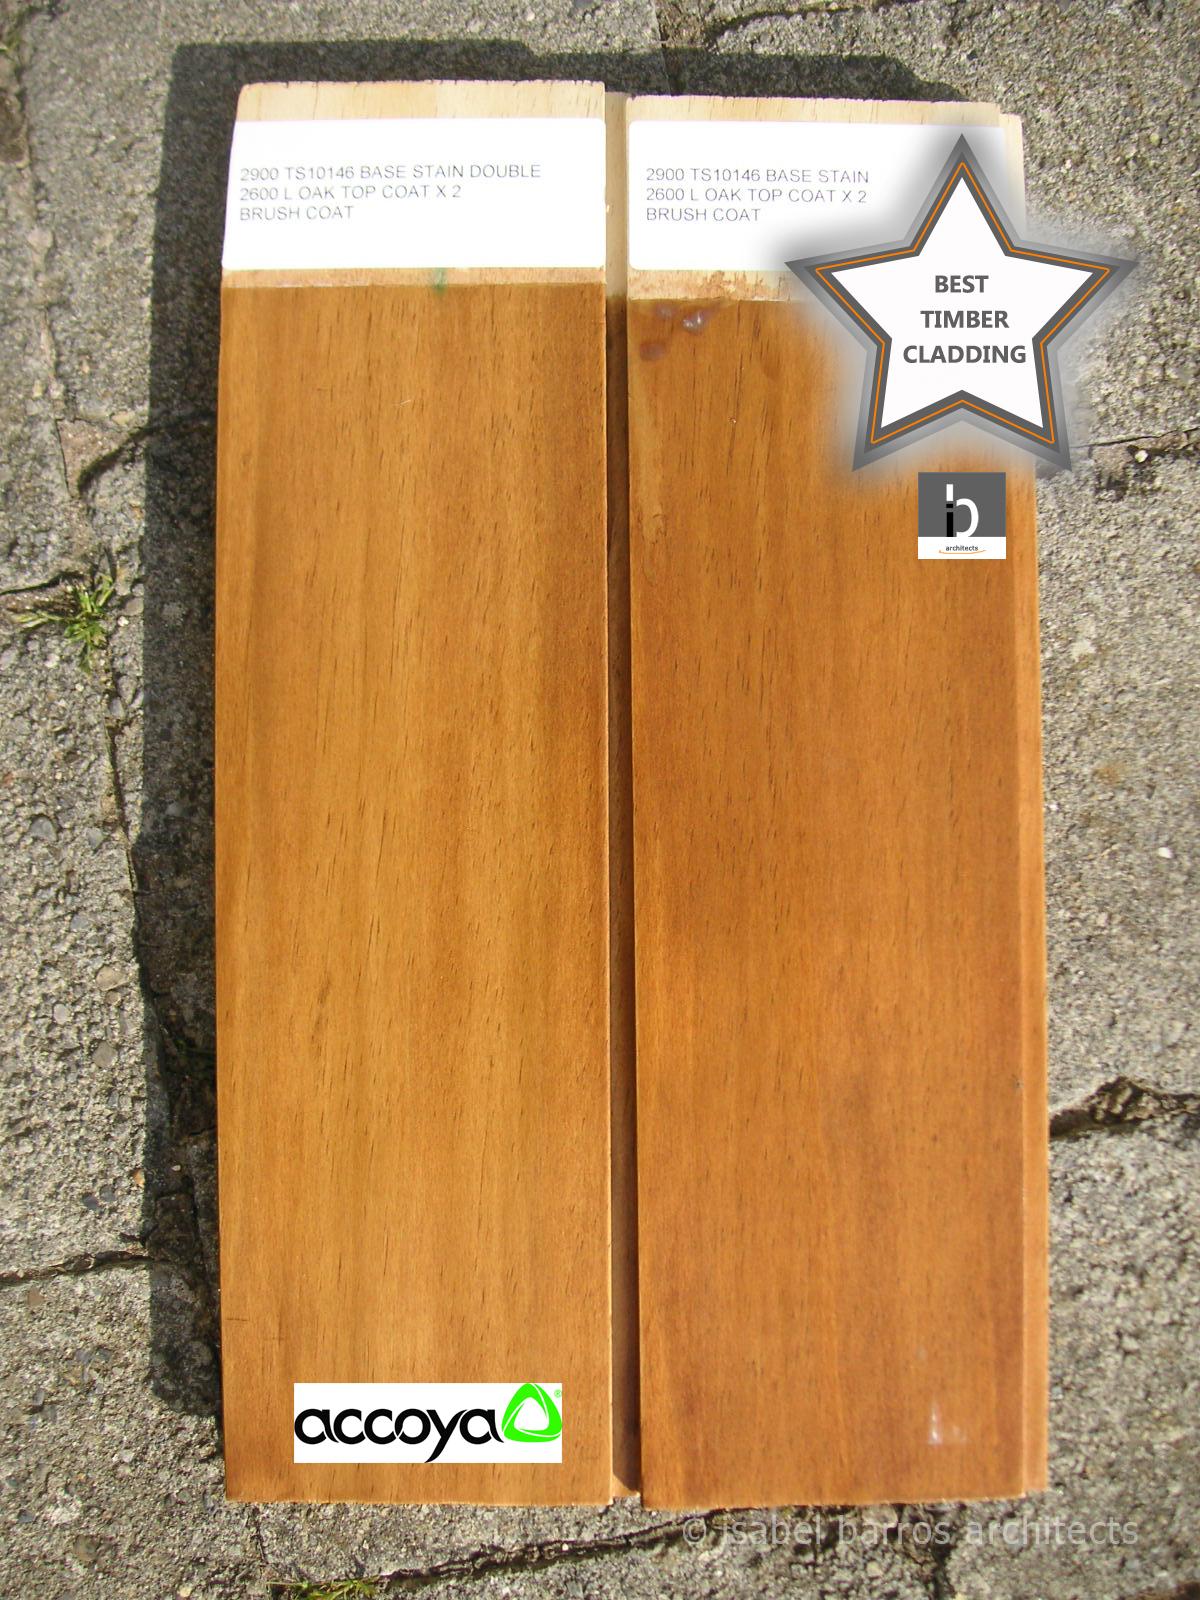 Accoya Timber Cladding